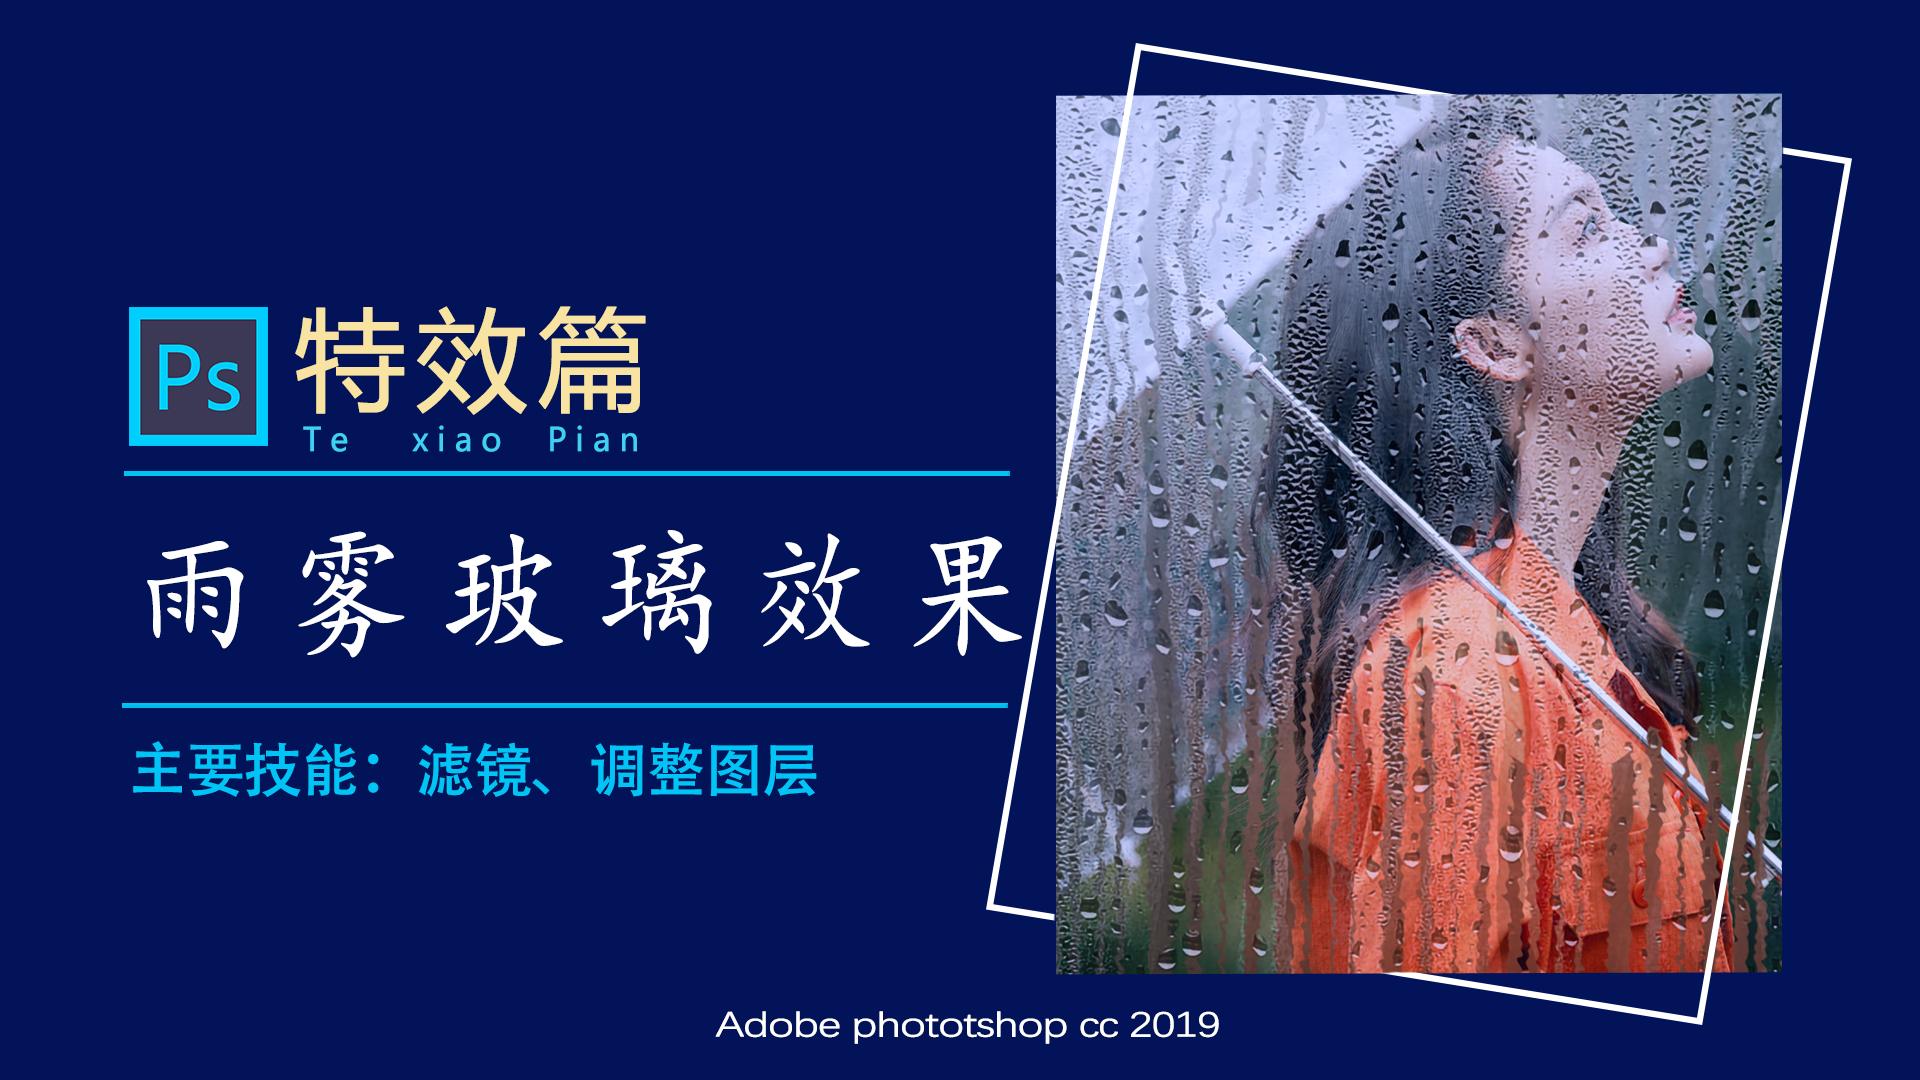 PS教程:制作雨雾玻璃效果,领略雨天别样的美